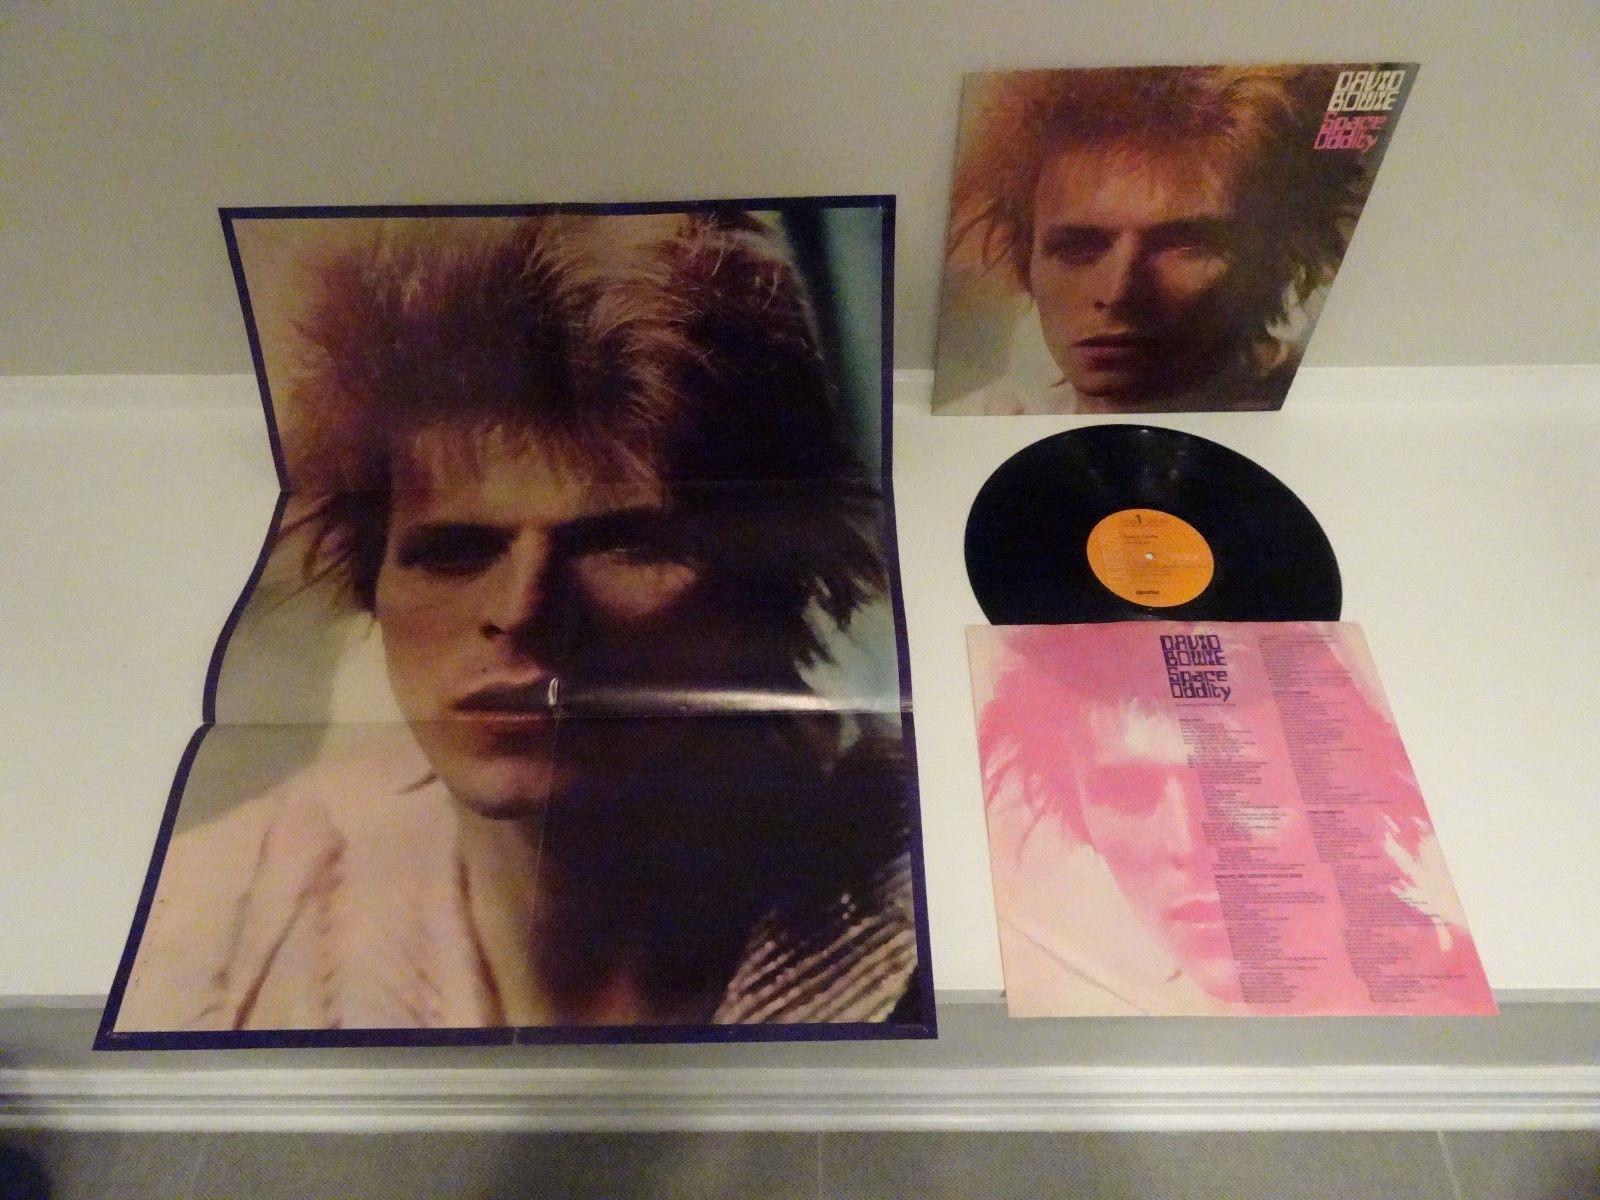 Виниловая пластинка и постер David Bowie «Space Oddity», 1972